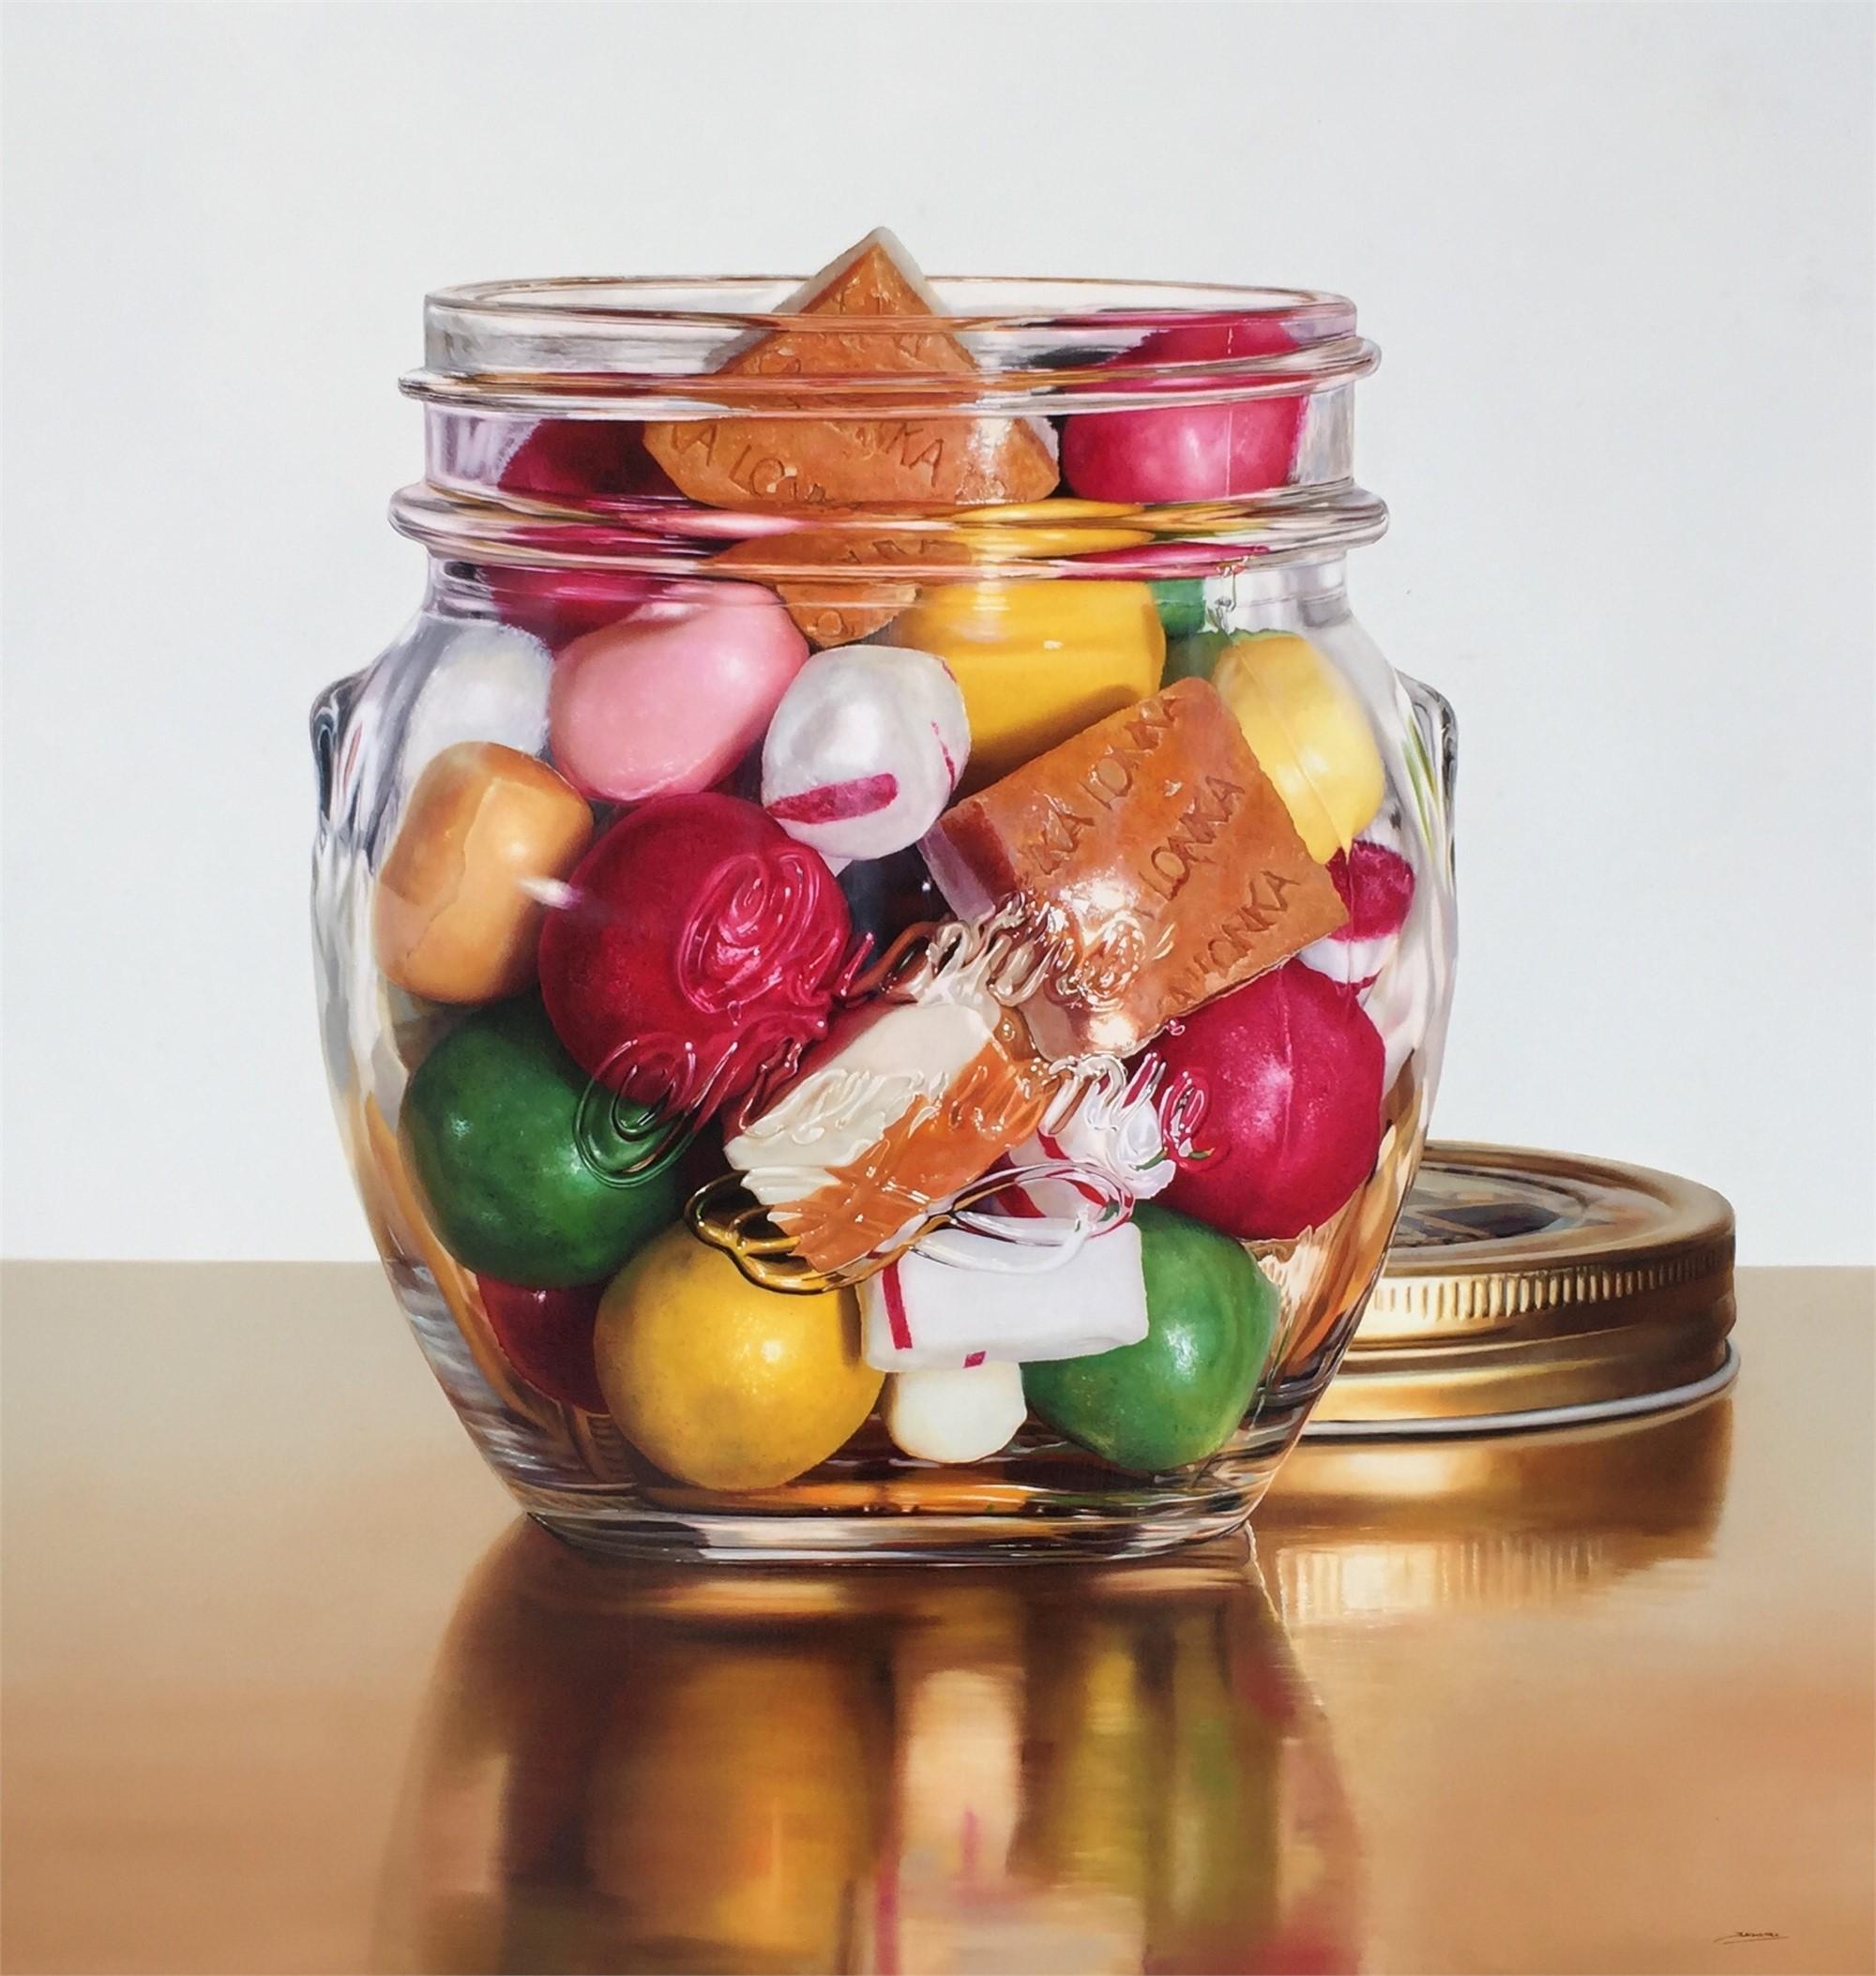 Sweet Temptations  by Jesus Navarro